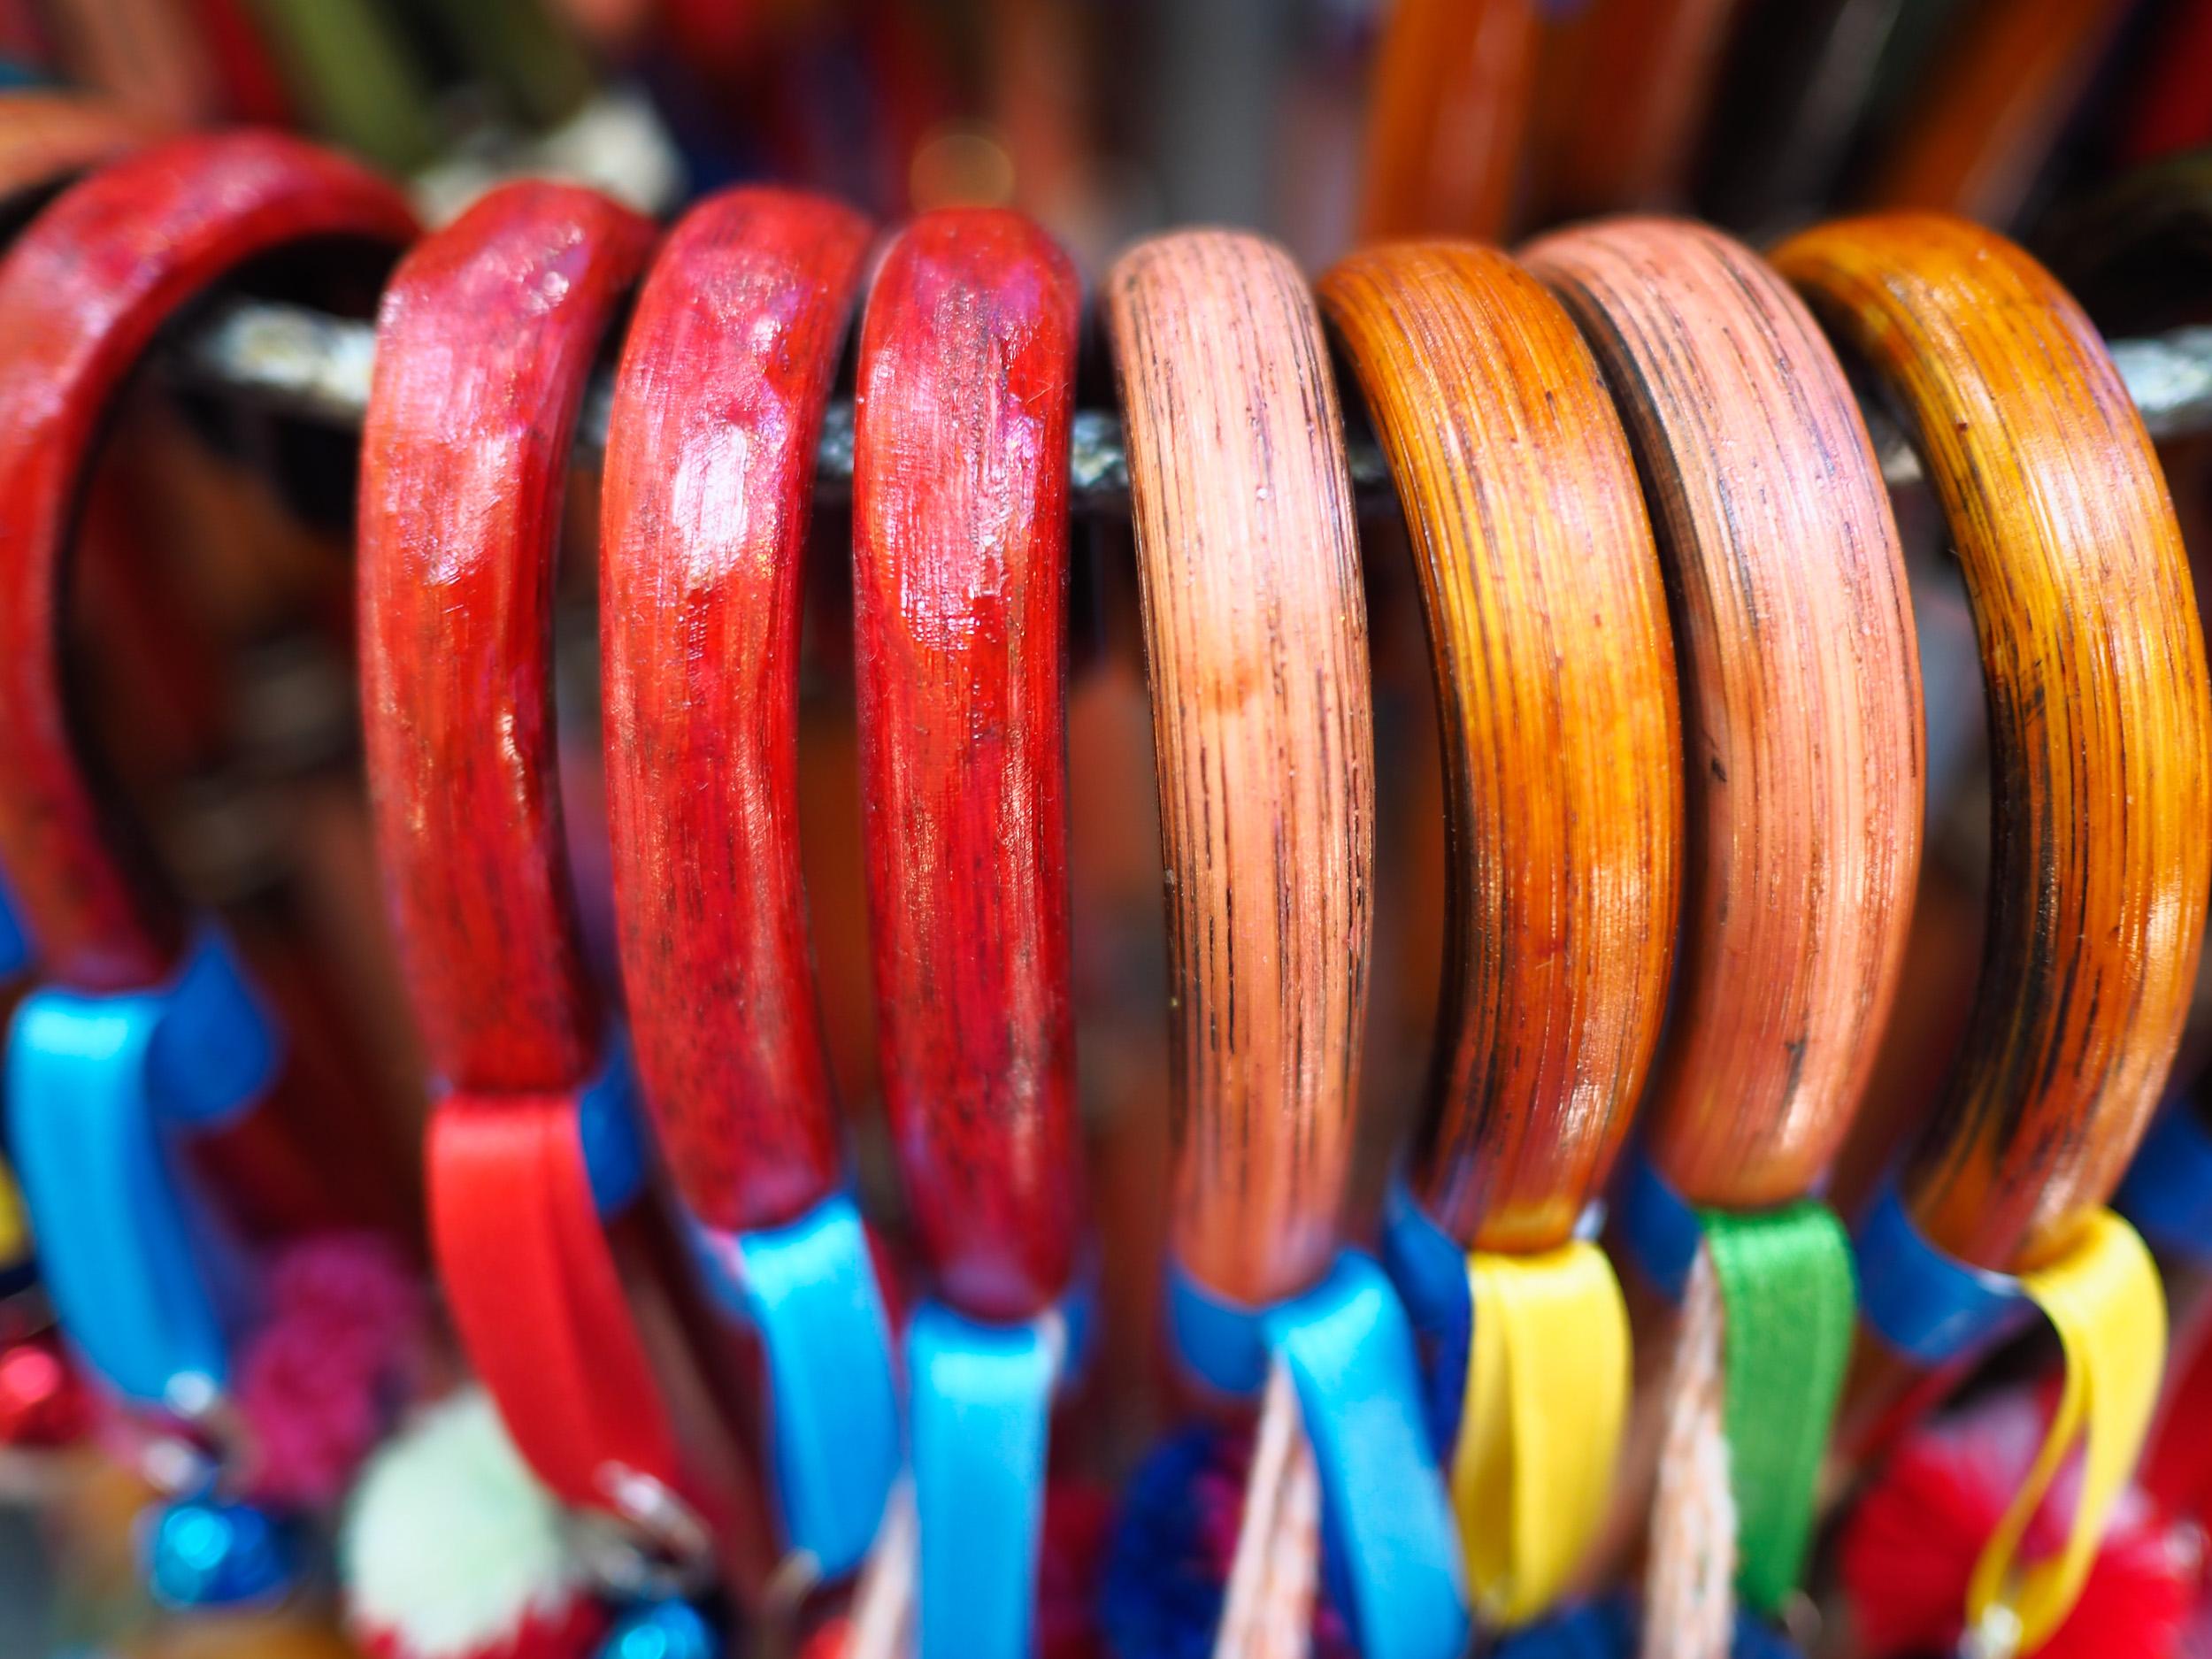 coloured walking stick handles-8170640.jpg